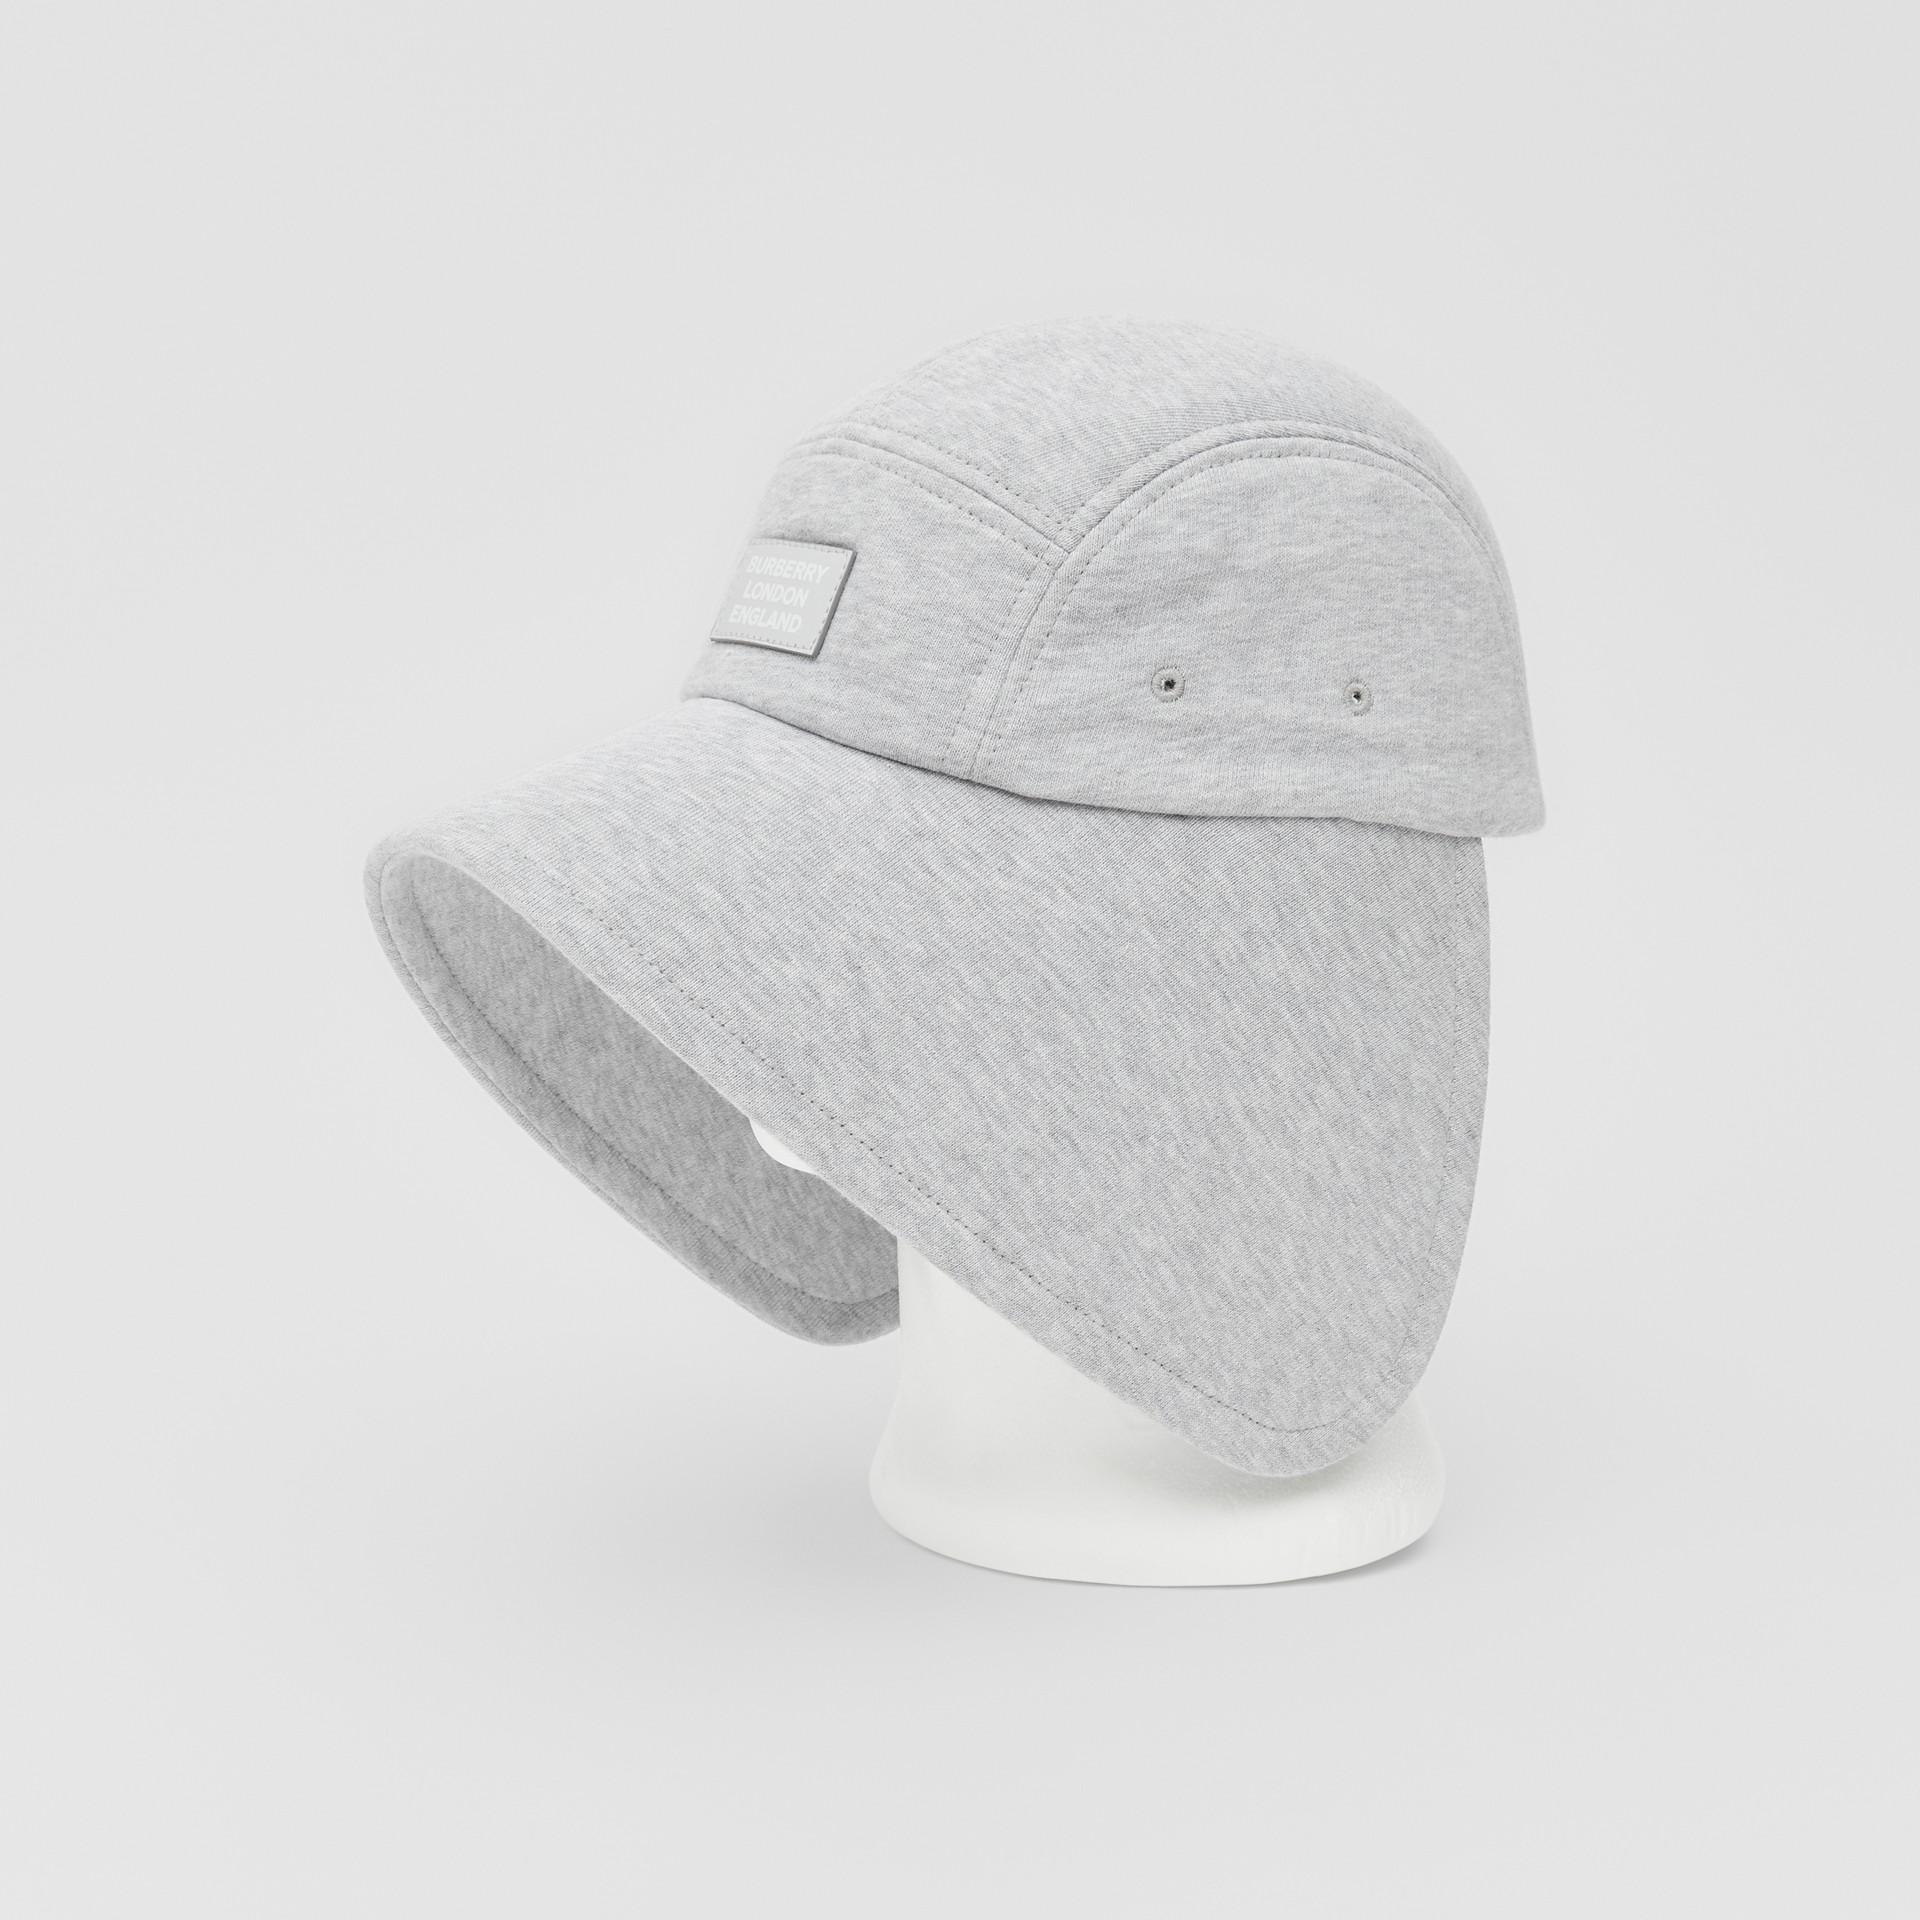 Logo Appliqué Cotton Jersey Bonnet Cap in Light Pebble Grey | Burberry - gallery image 5